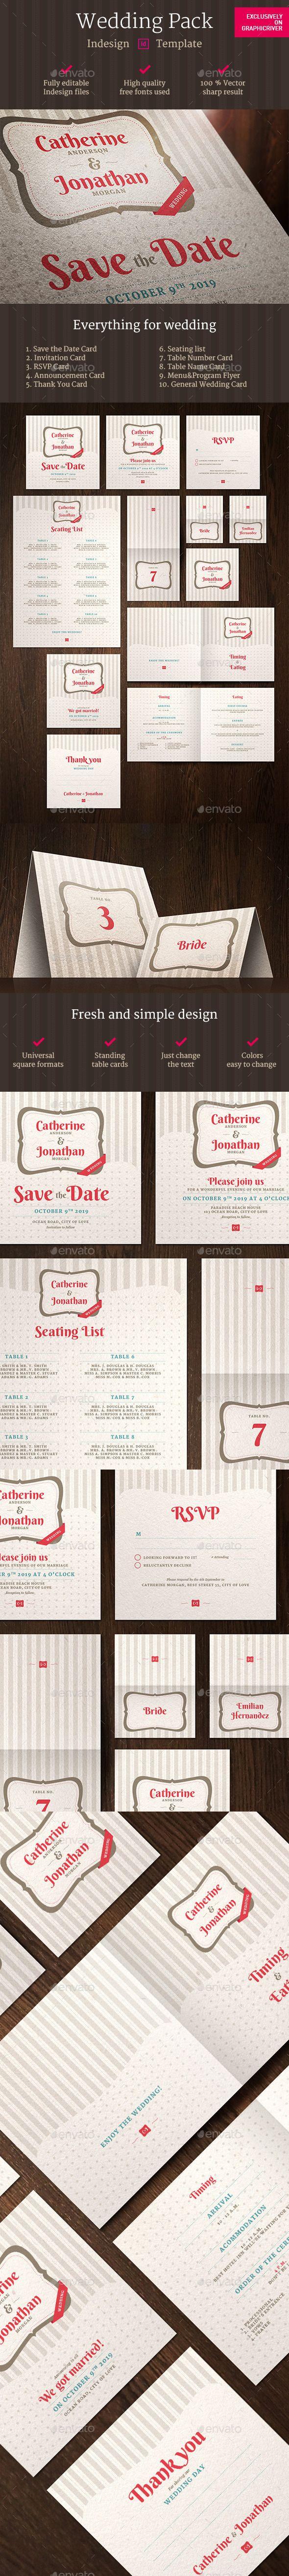 Wedding Pack Indesign Template   Indesign templates, Print templates ...